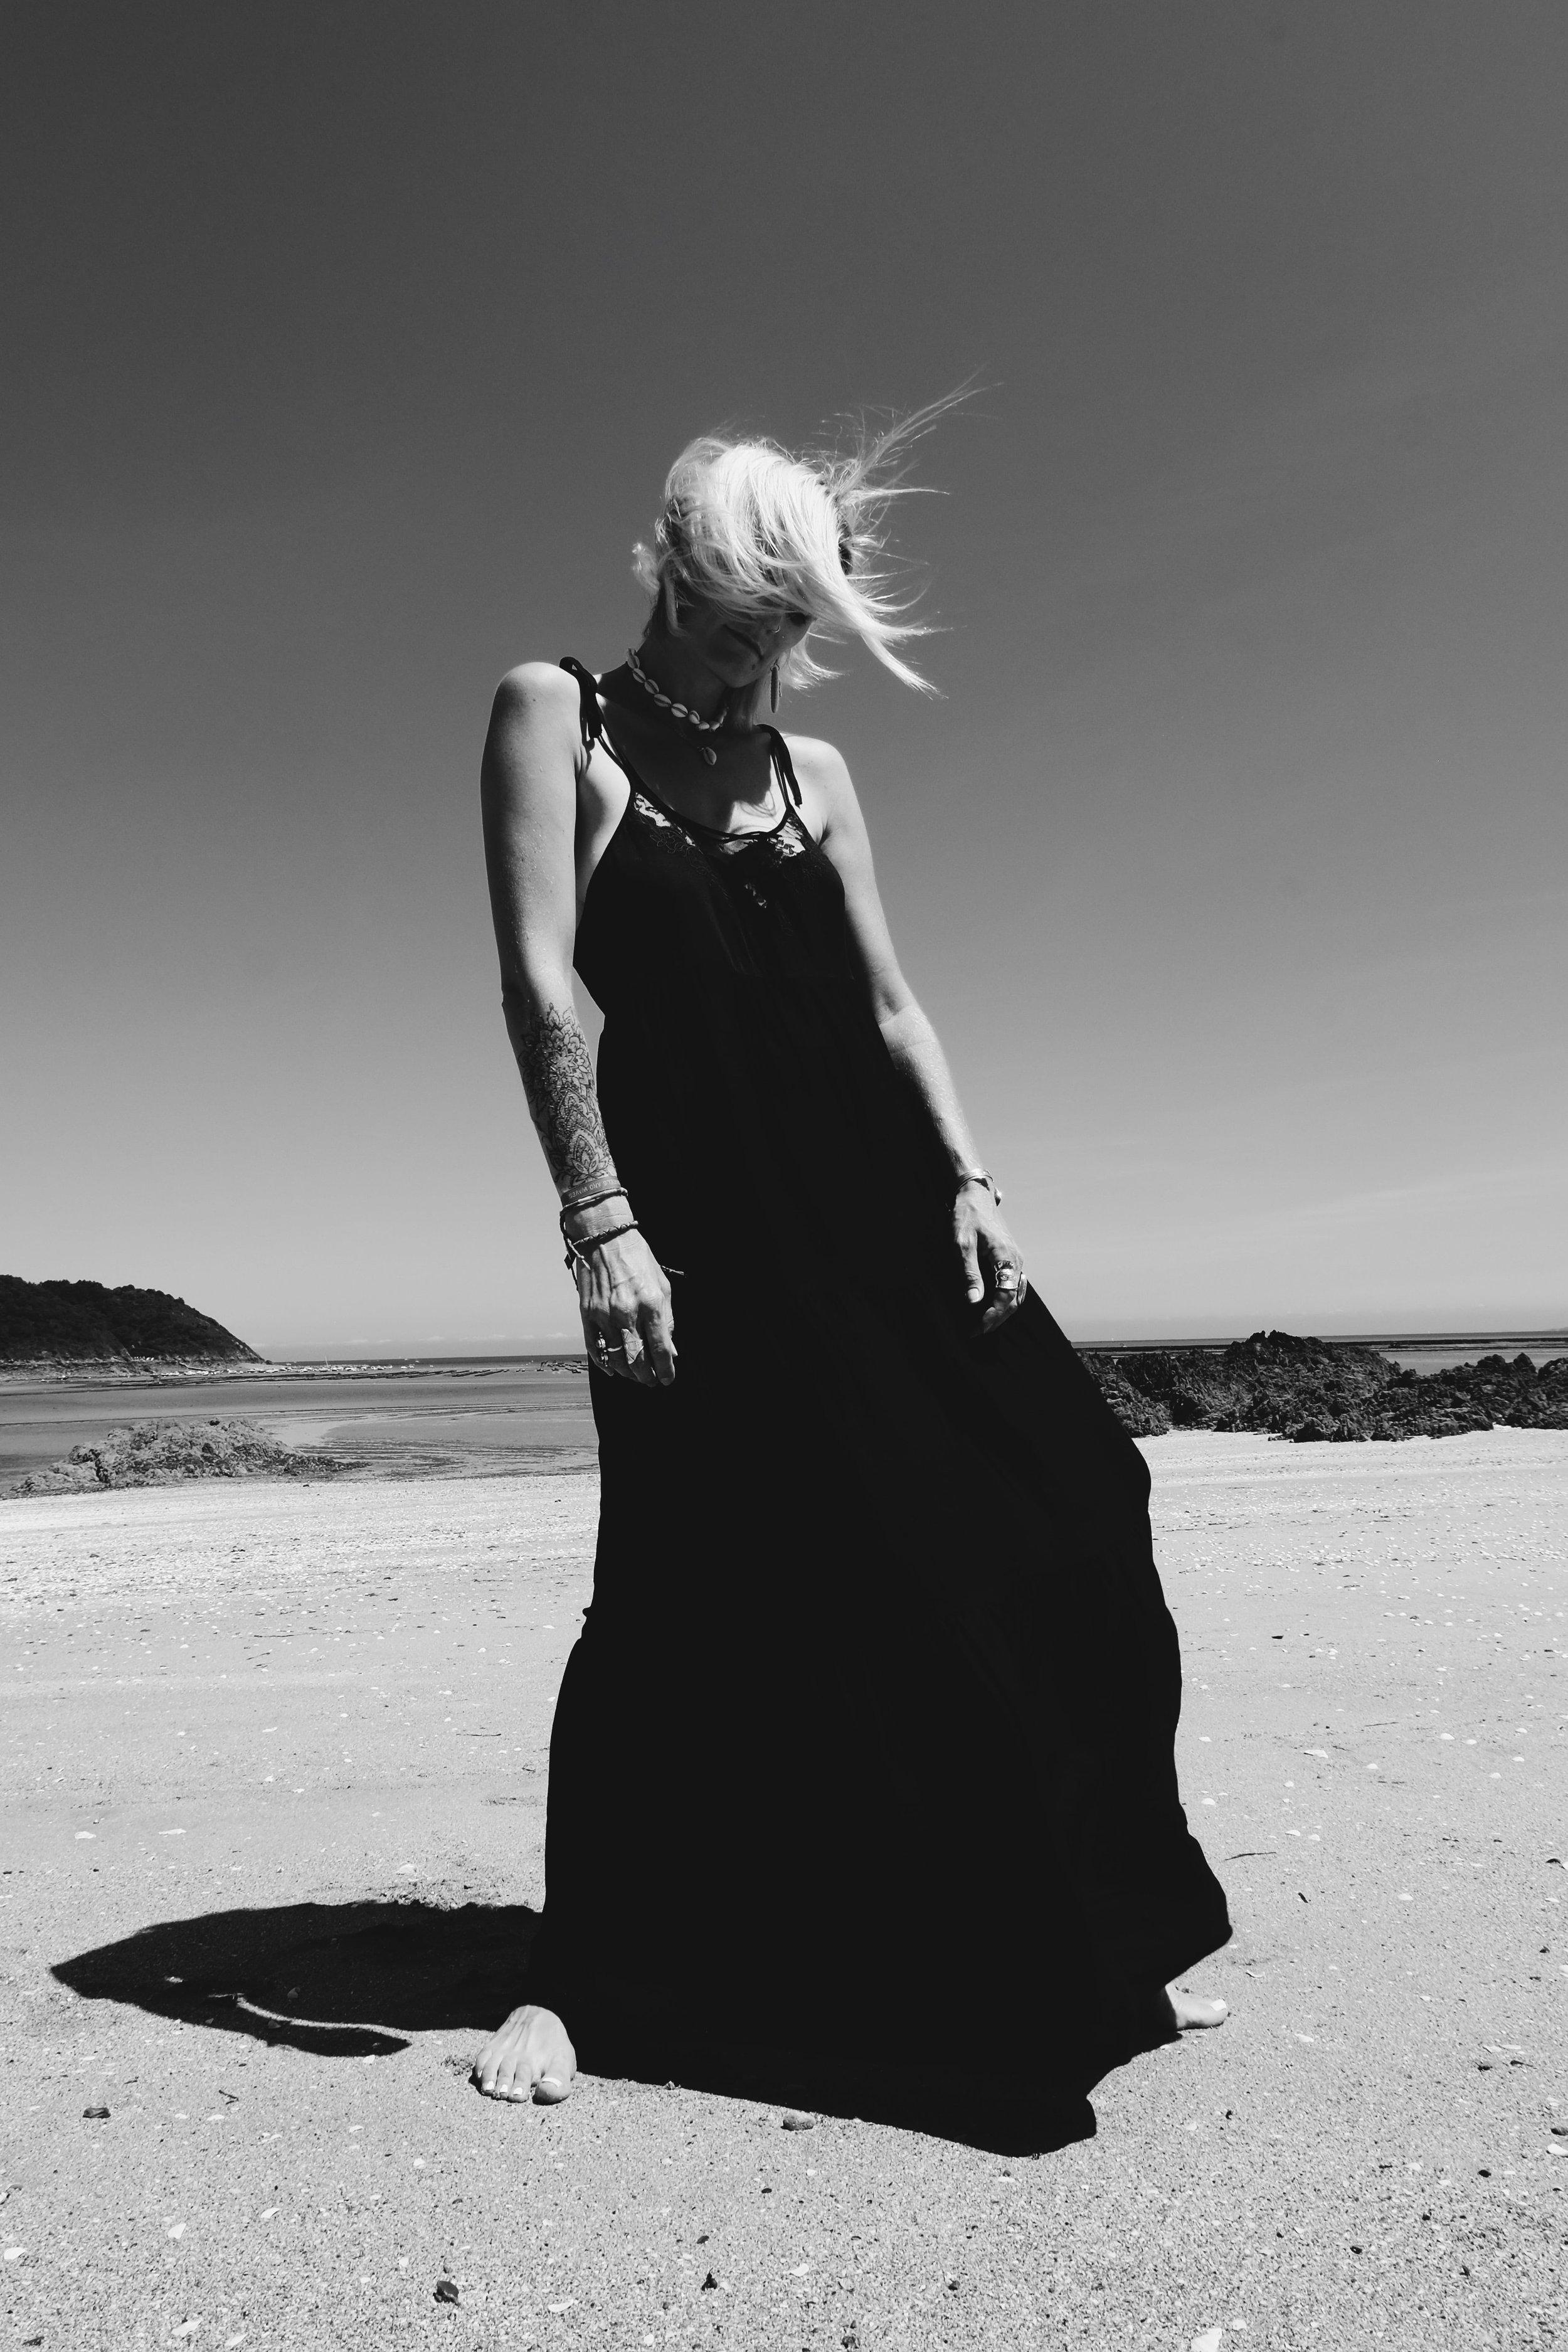 Carnet Sauvage - robe longue noire Stradivarius6-min.JPG